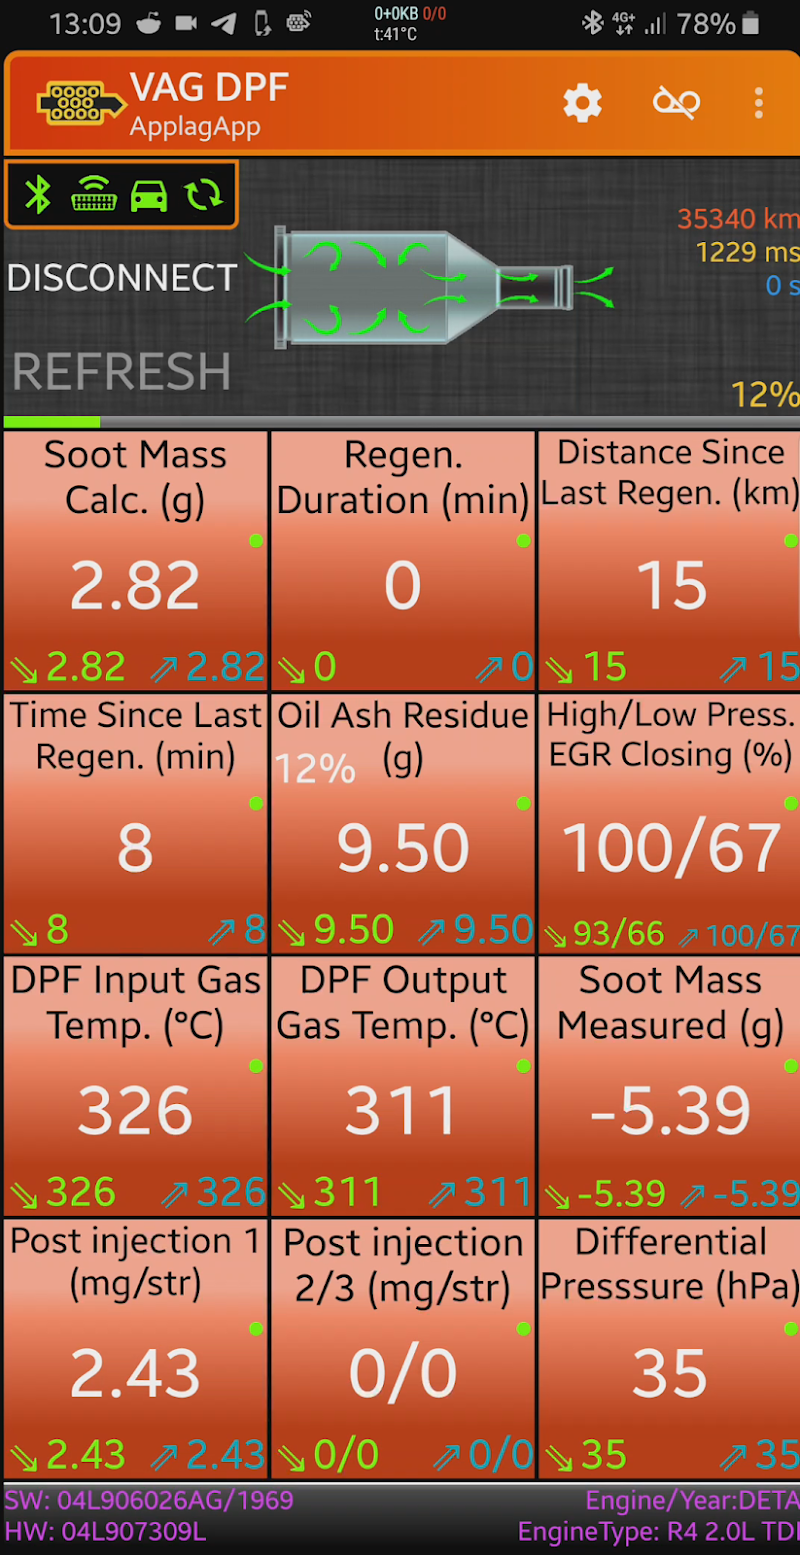 VAG DPF Screenshot 5